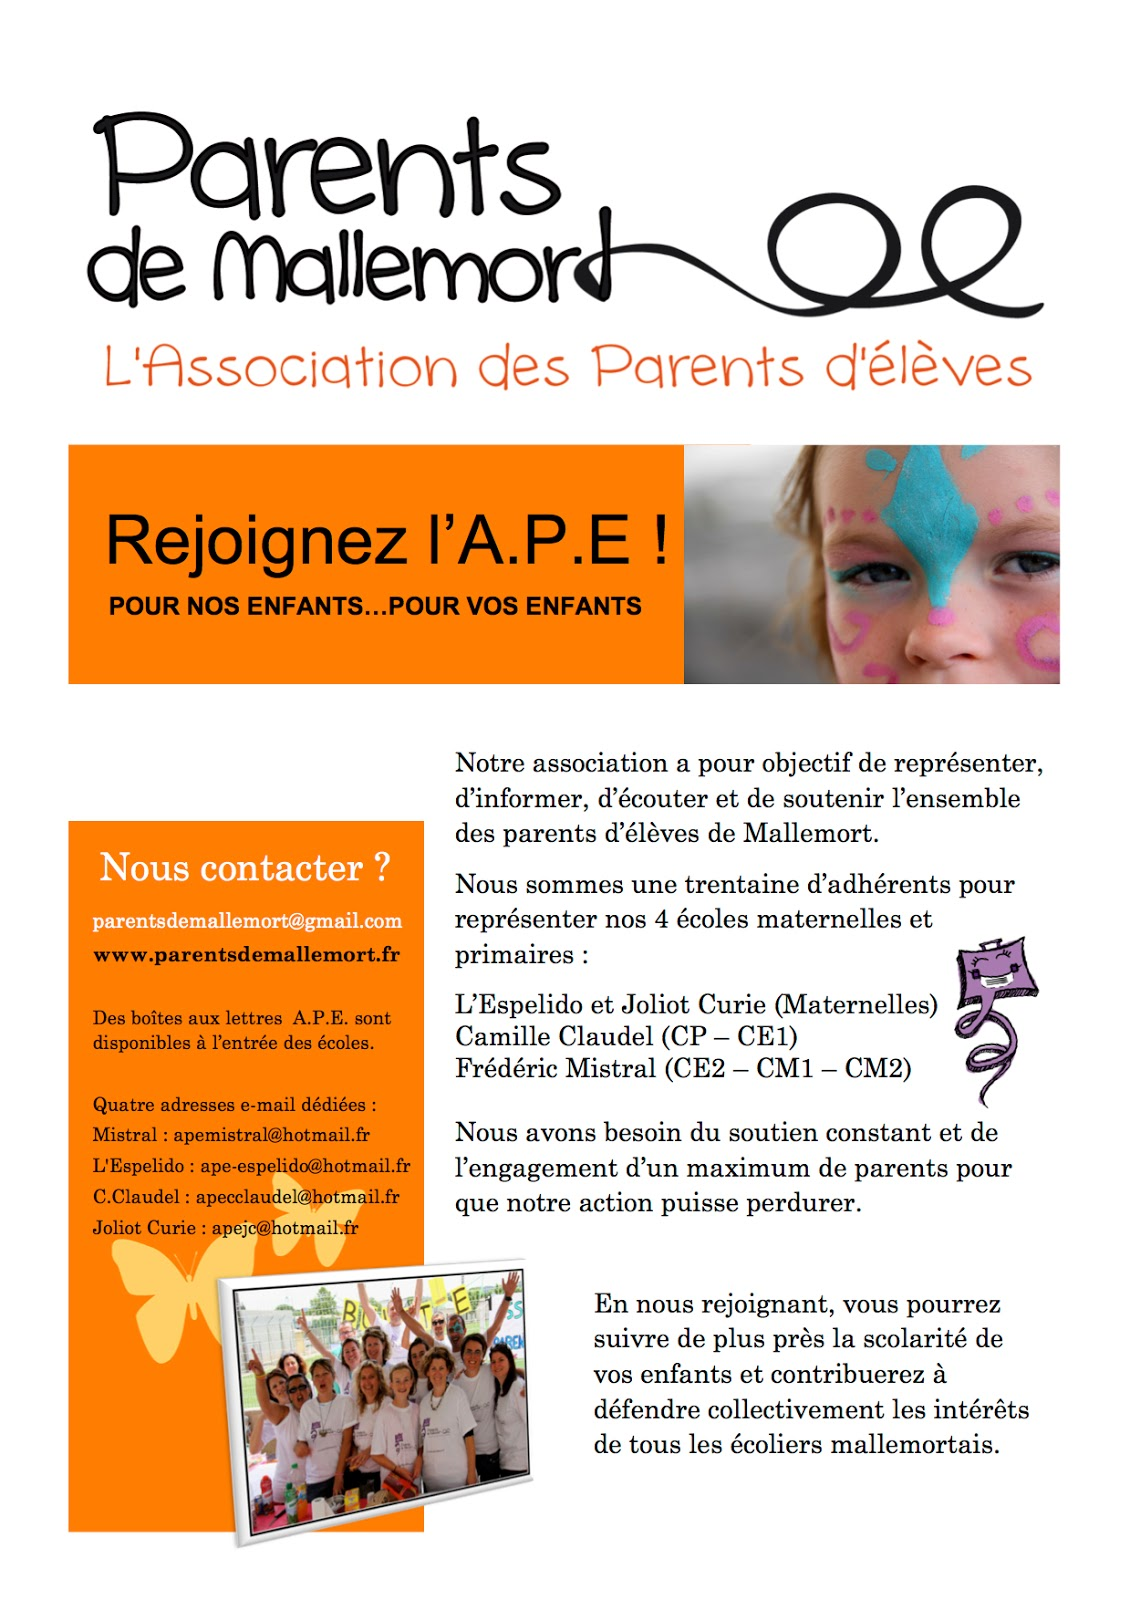 Butin Noir Shemale Masterbation De Compilation Travesti Bordeaux Cougar Rencontr La Laye